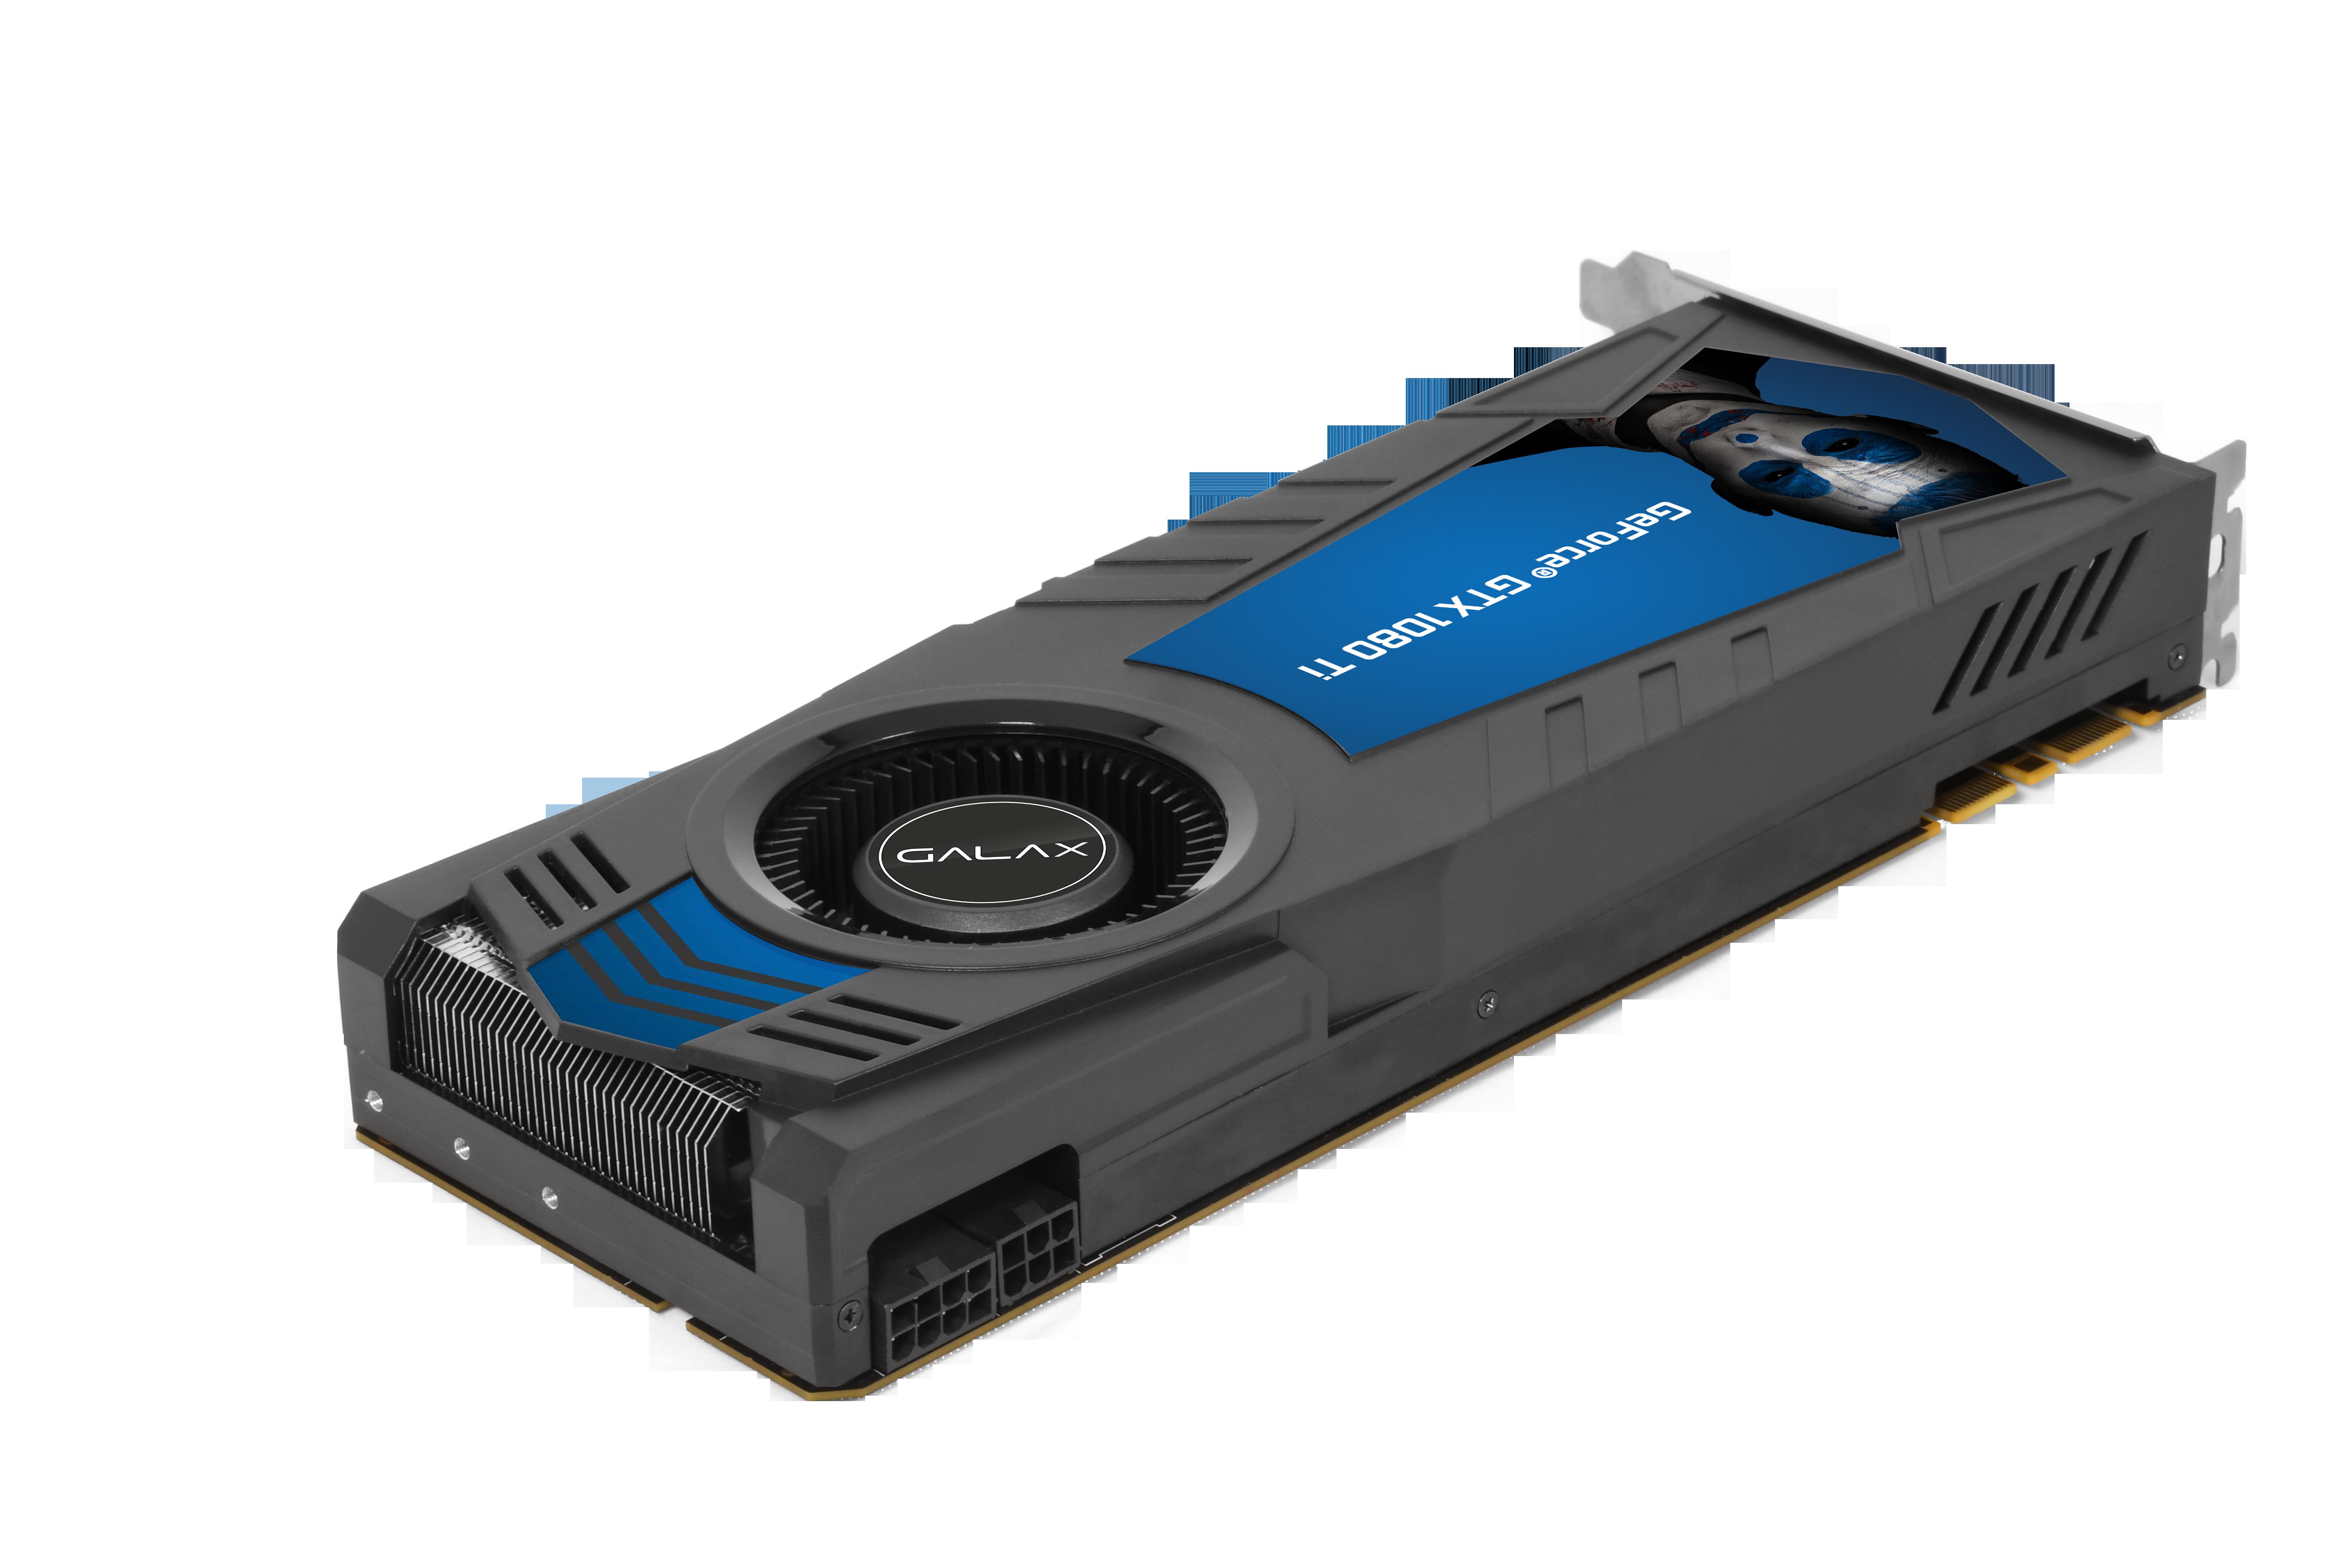 GALAX/KFA2 GeForce GTX 1080 Ti